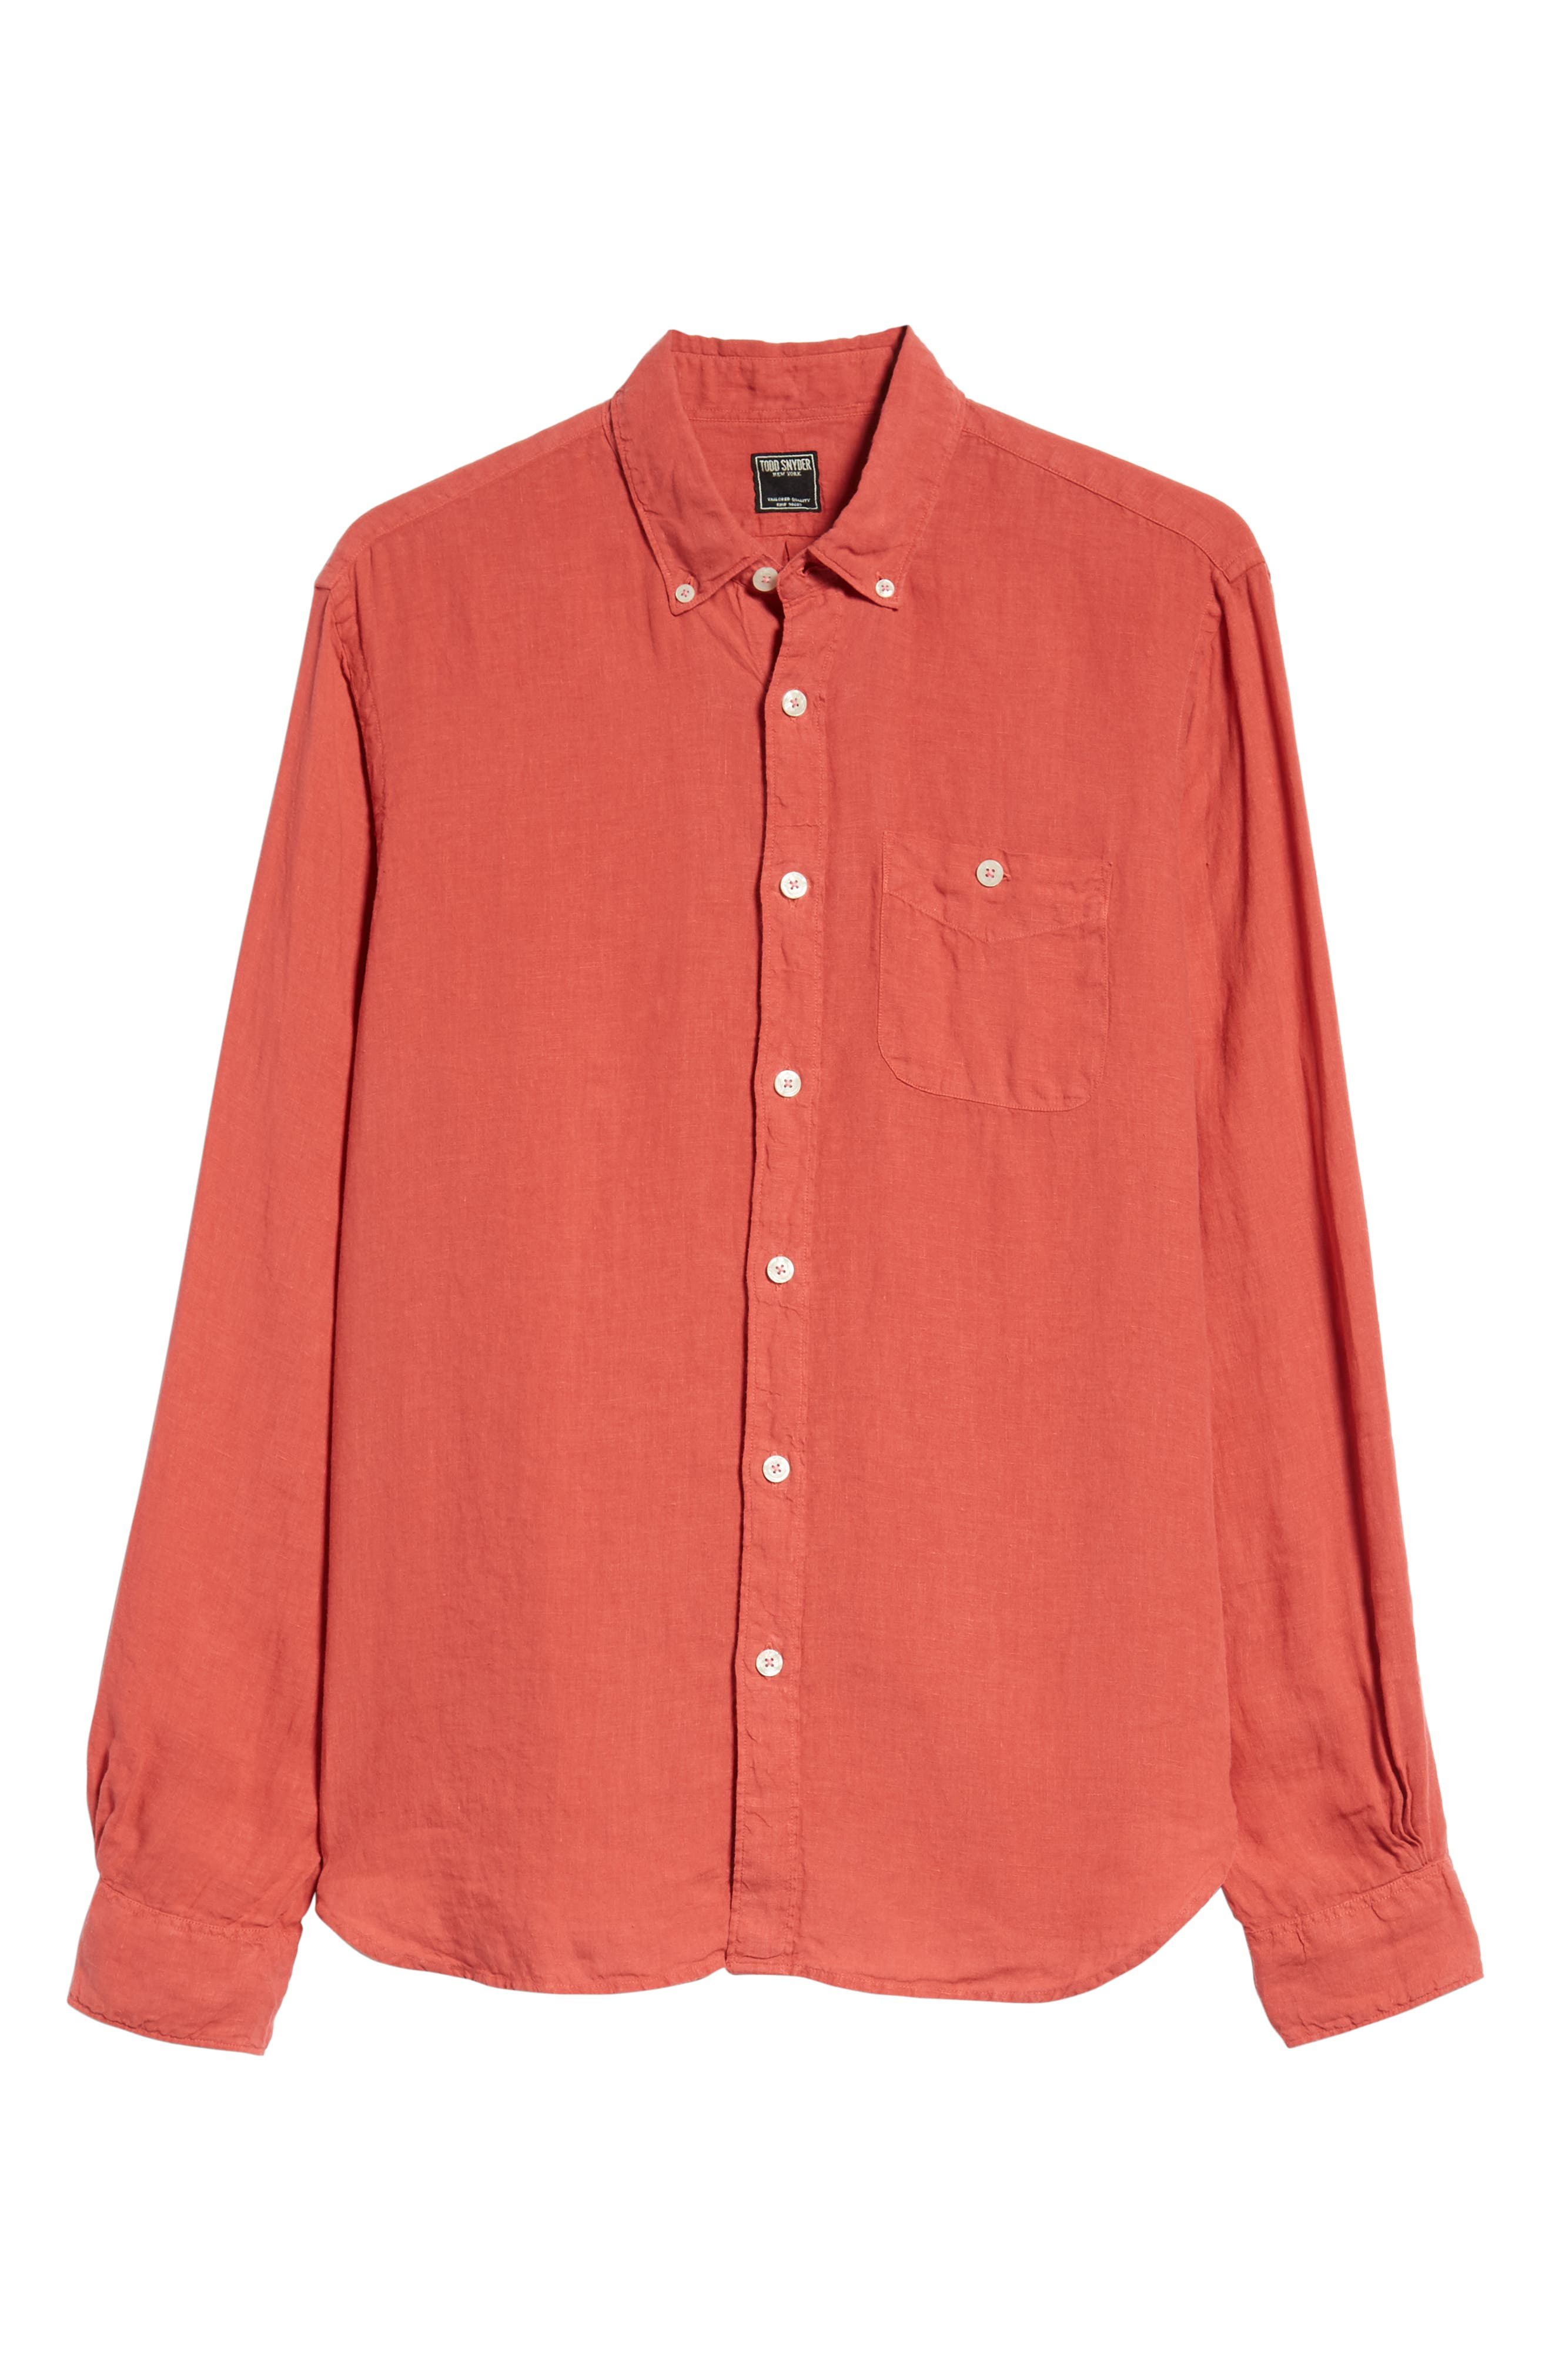 TODD SNYDER,                             Regular Fit Linen Sport Shirt,                             Alternate thumbnail 5, color,                             647